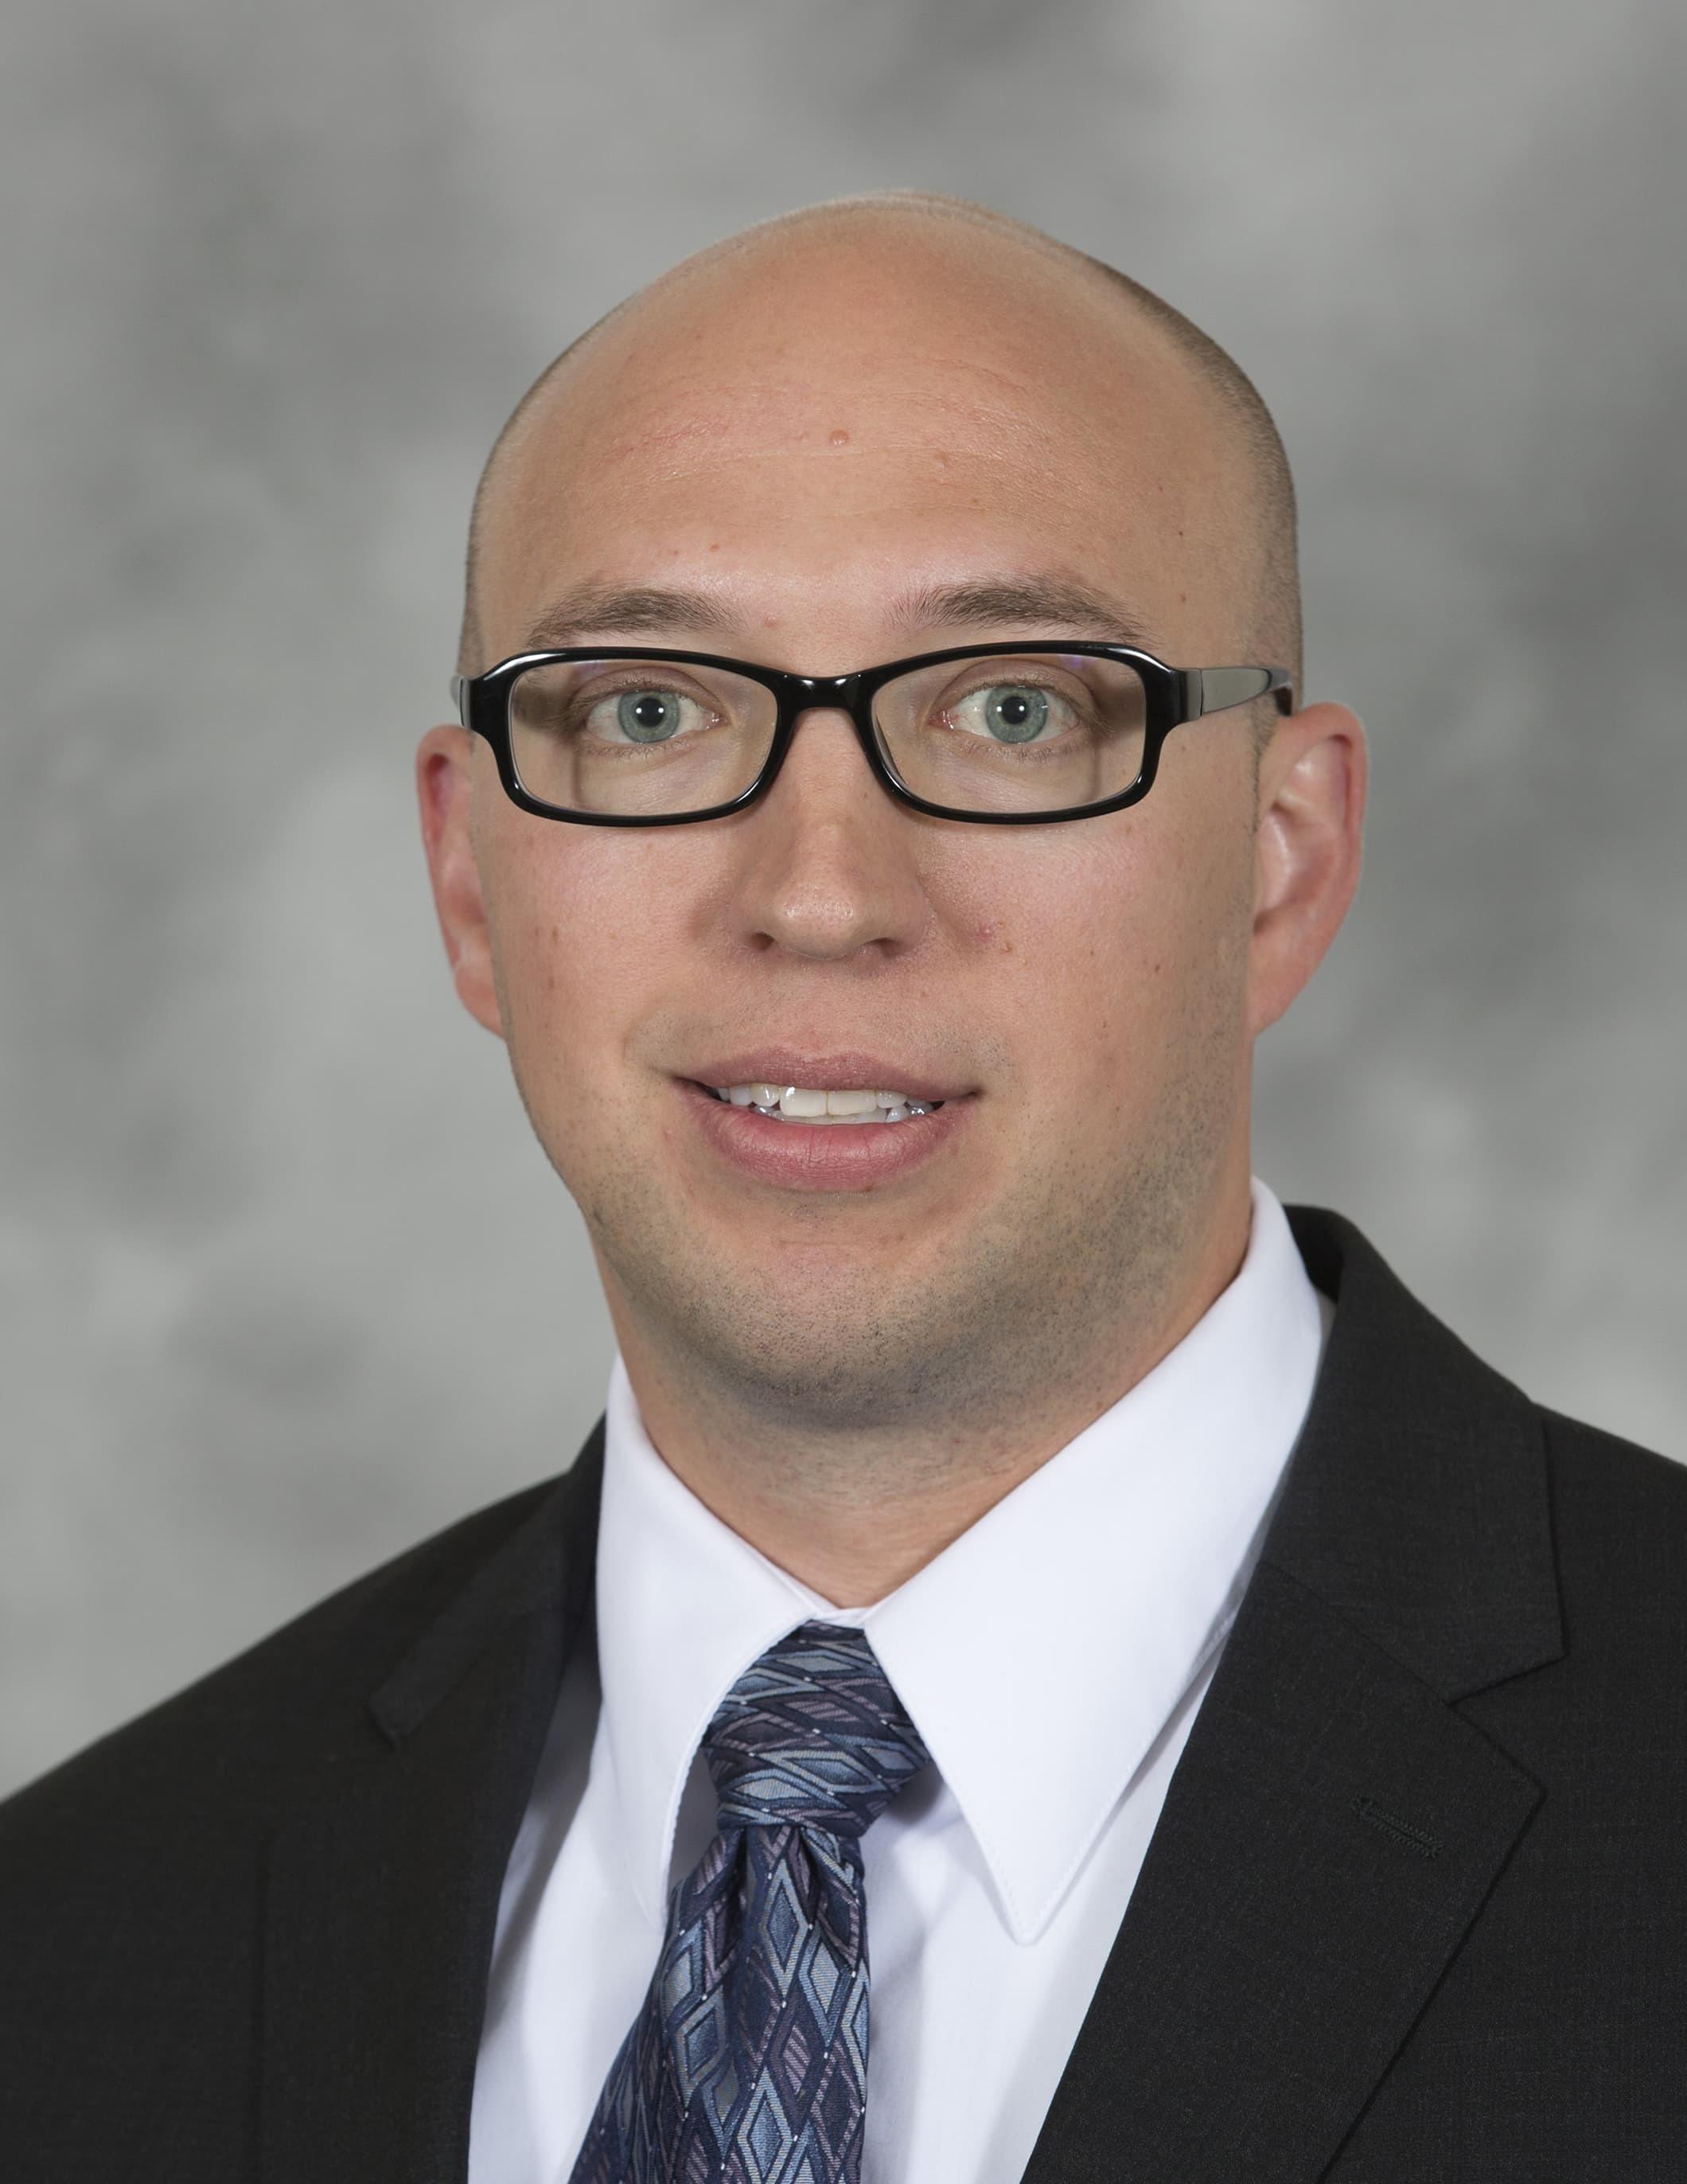 Ryan M Mitchell, MD PhD